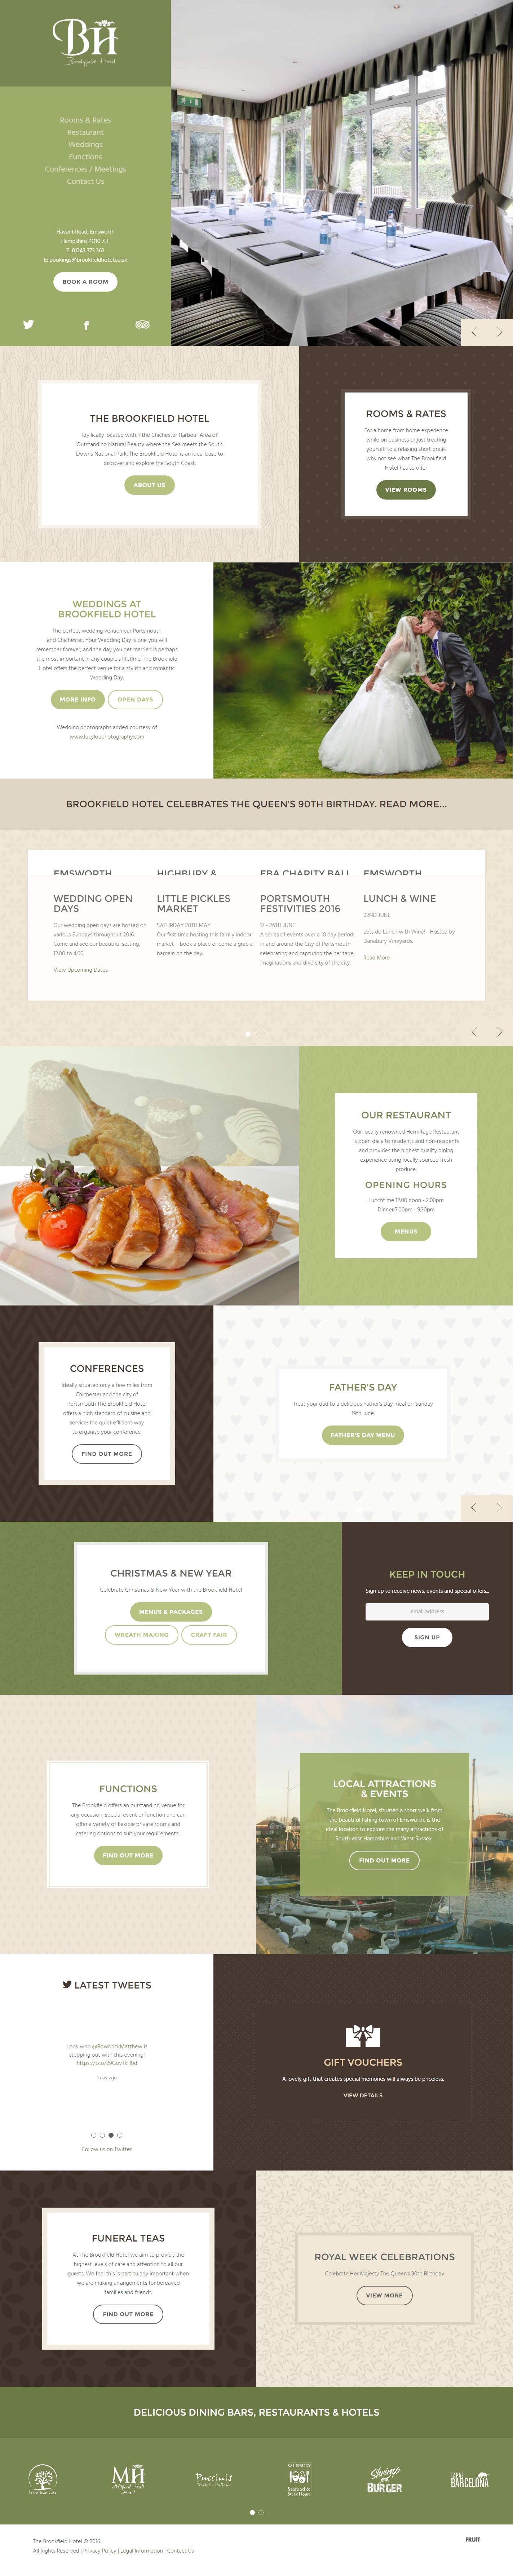 Web Design Emsworth - The Web Taylor